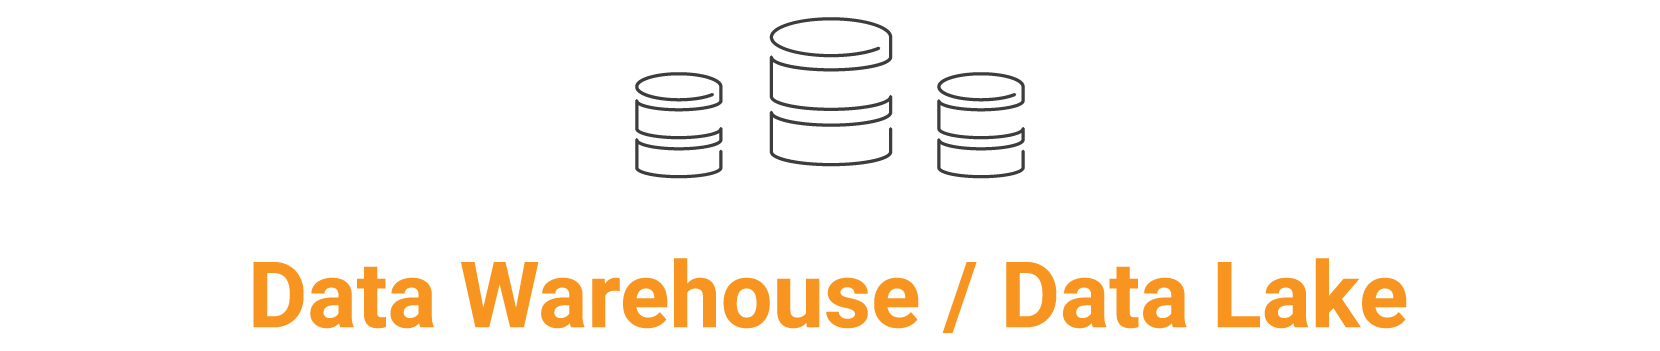 Data Warehouse - Data Lake + ICON copy 2 (2)